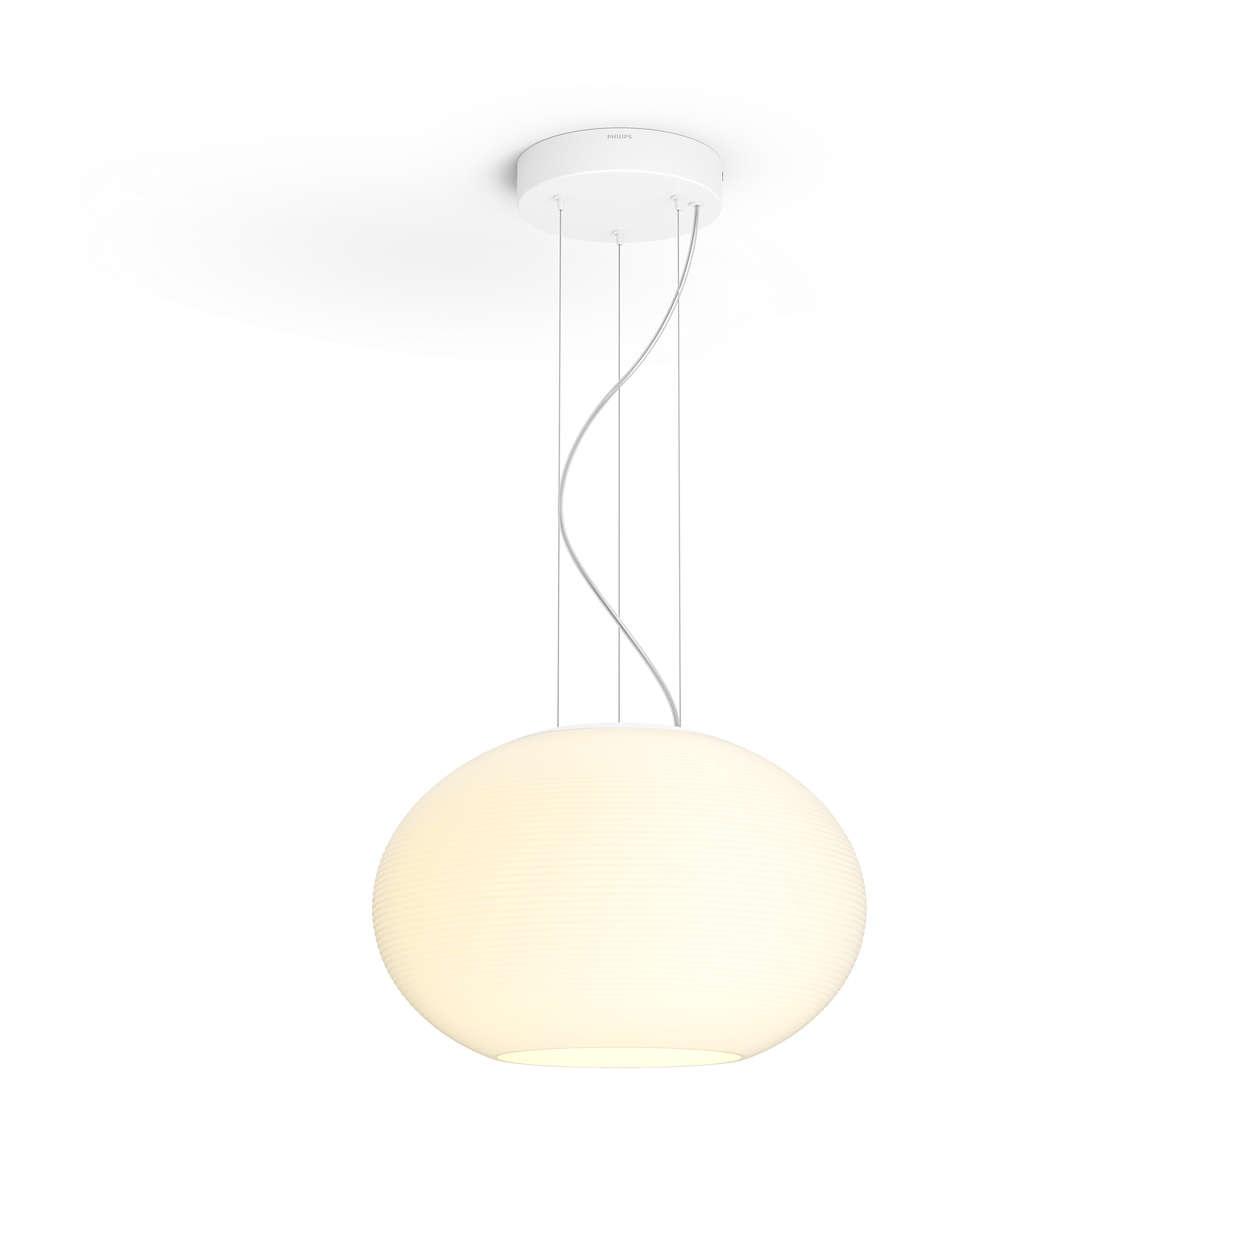 PHILIPS Flourish Závěsné svítidlo, Hue White and color ambiance, 230V, 1x32W integr.LED, Bílá